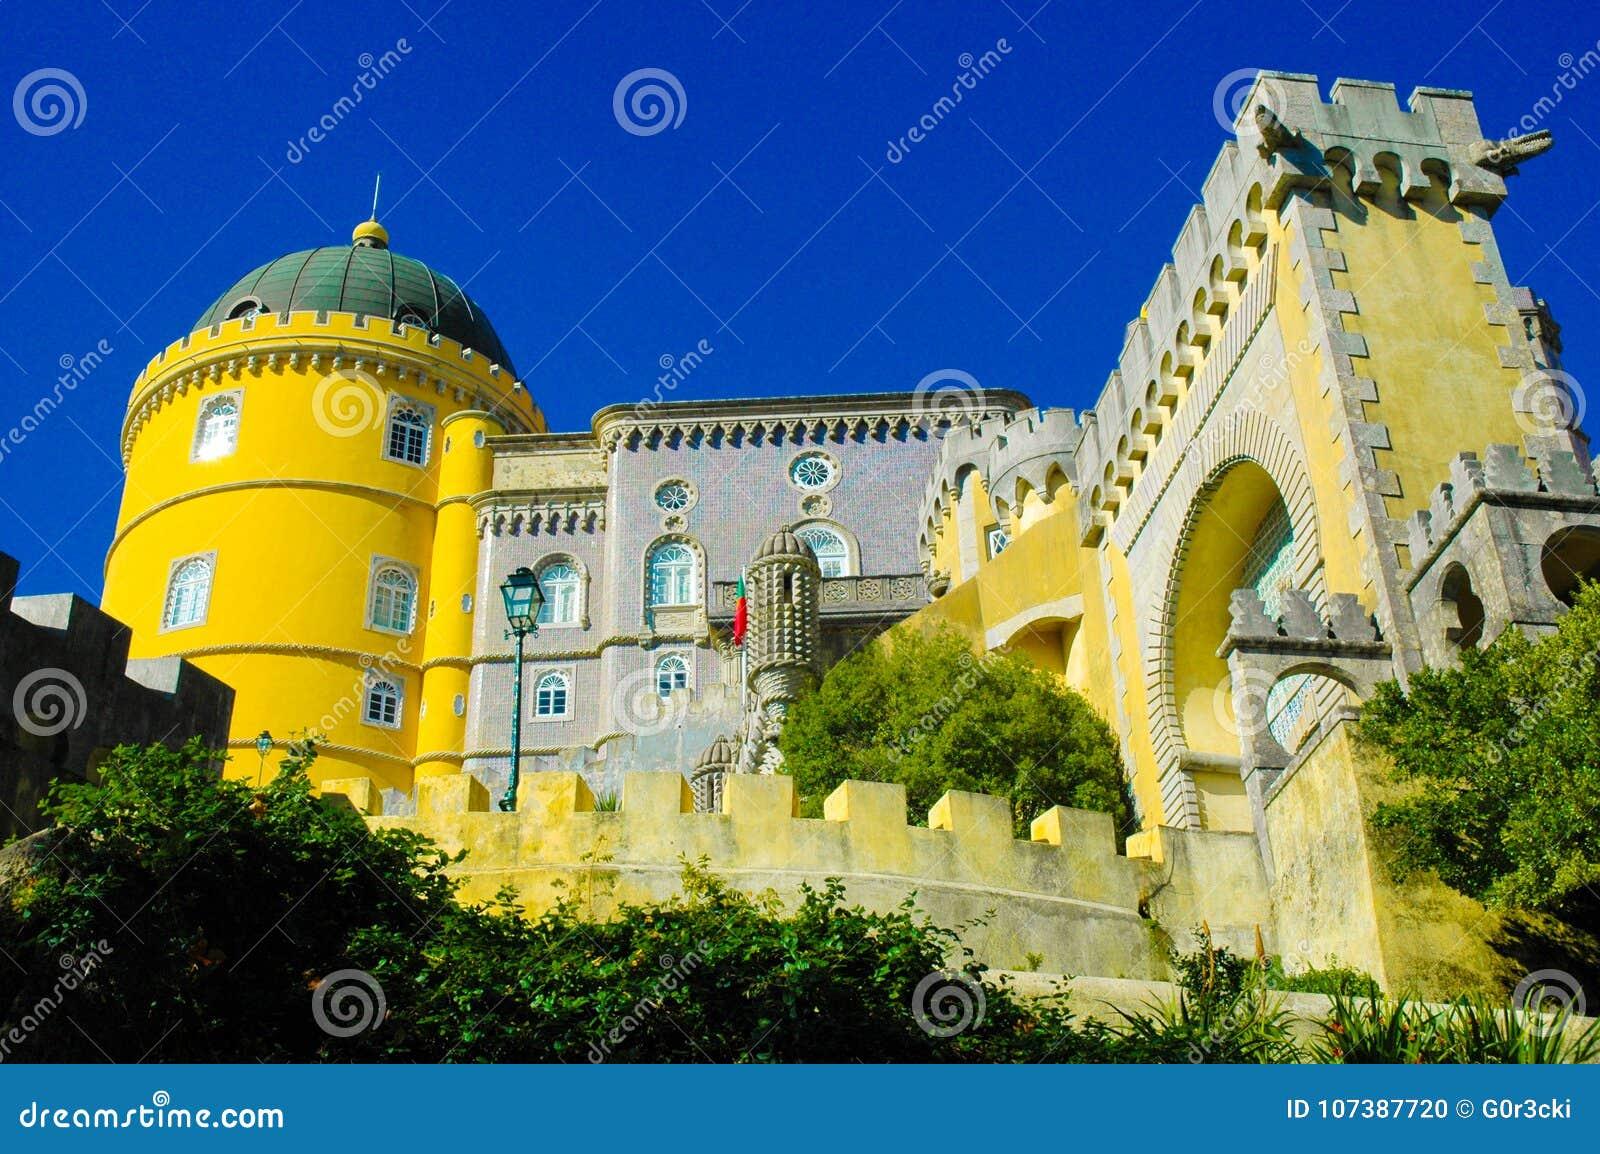 Sintra Pena National Palace Facade and Moorish Gate, Travel Lisbon, Portugal